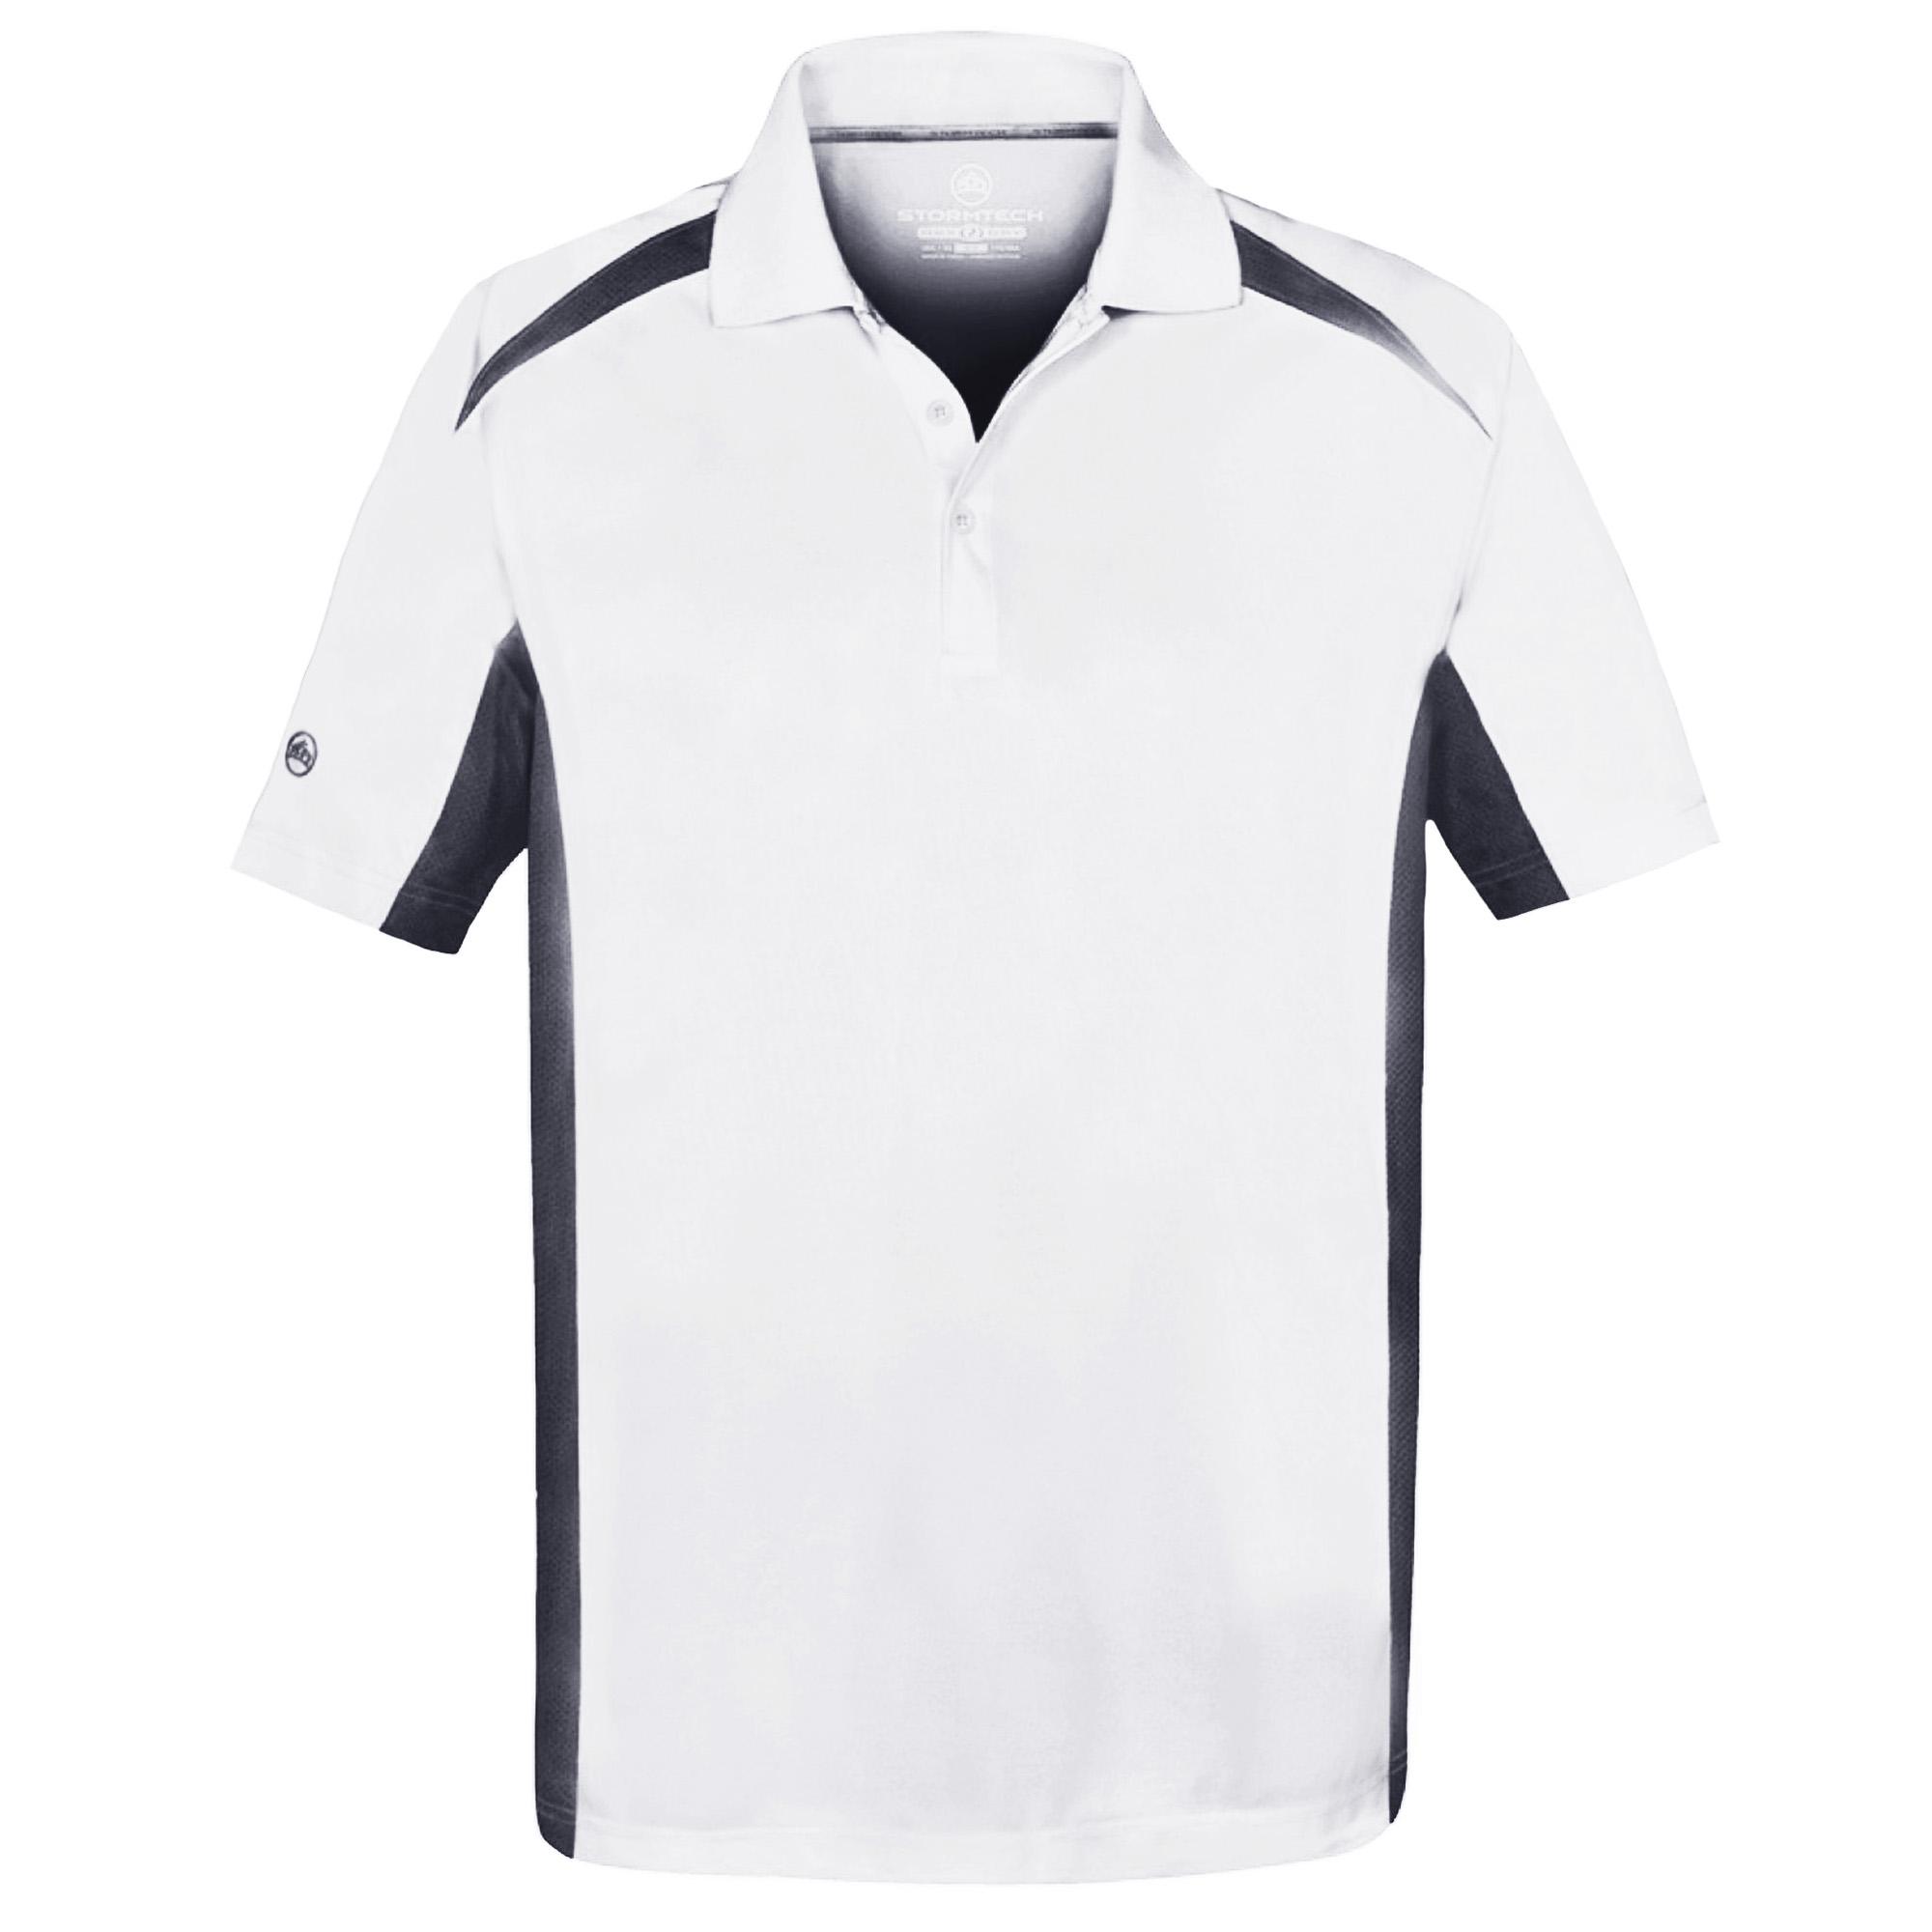 Stormtech Mens Two Tone Short Sleeve Lightweight Polo Shirt (XL) (White/Navy)